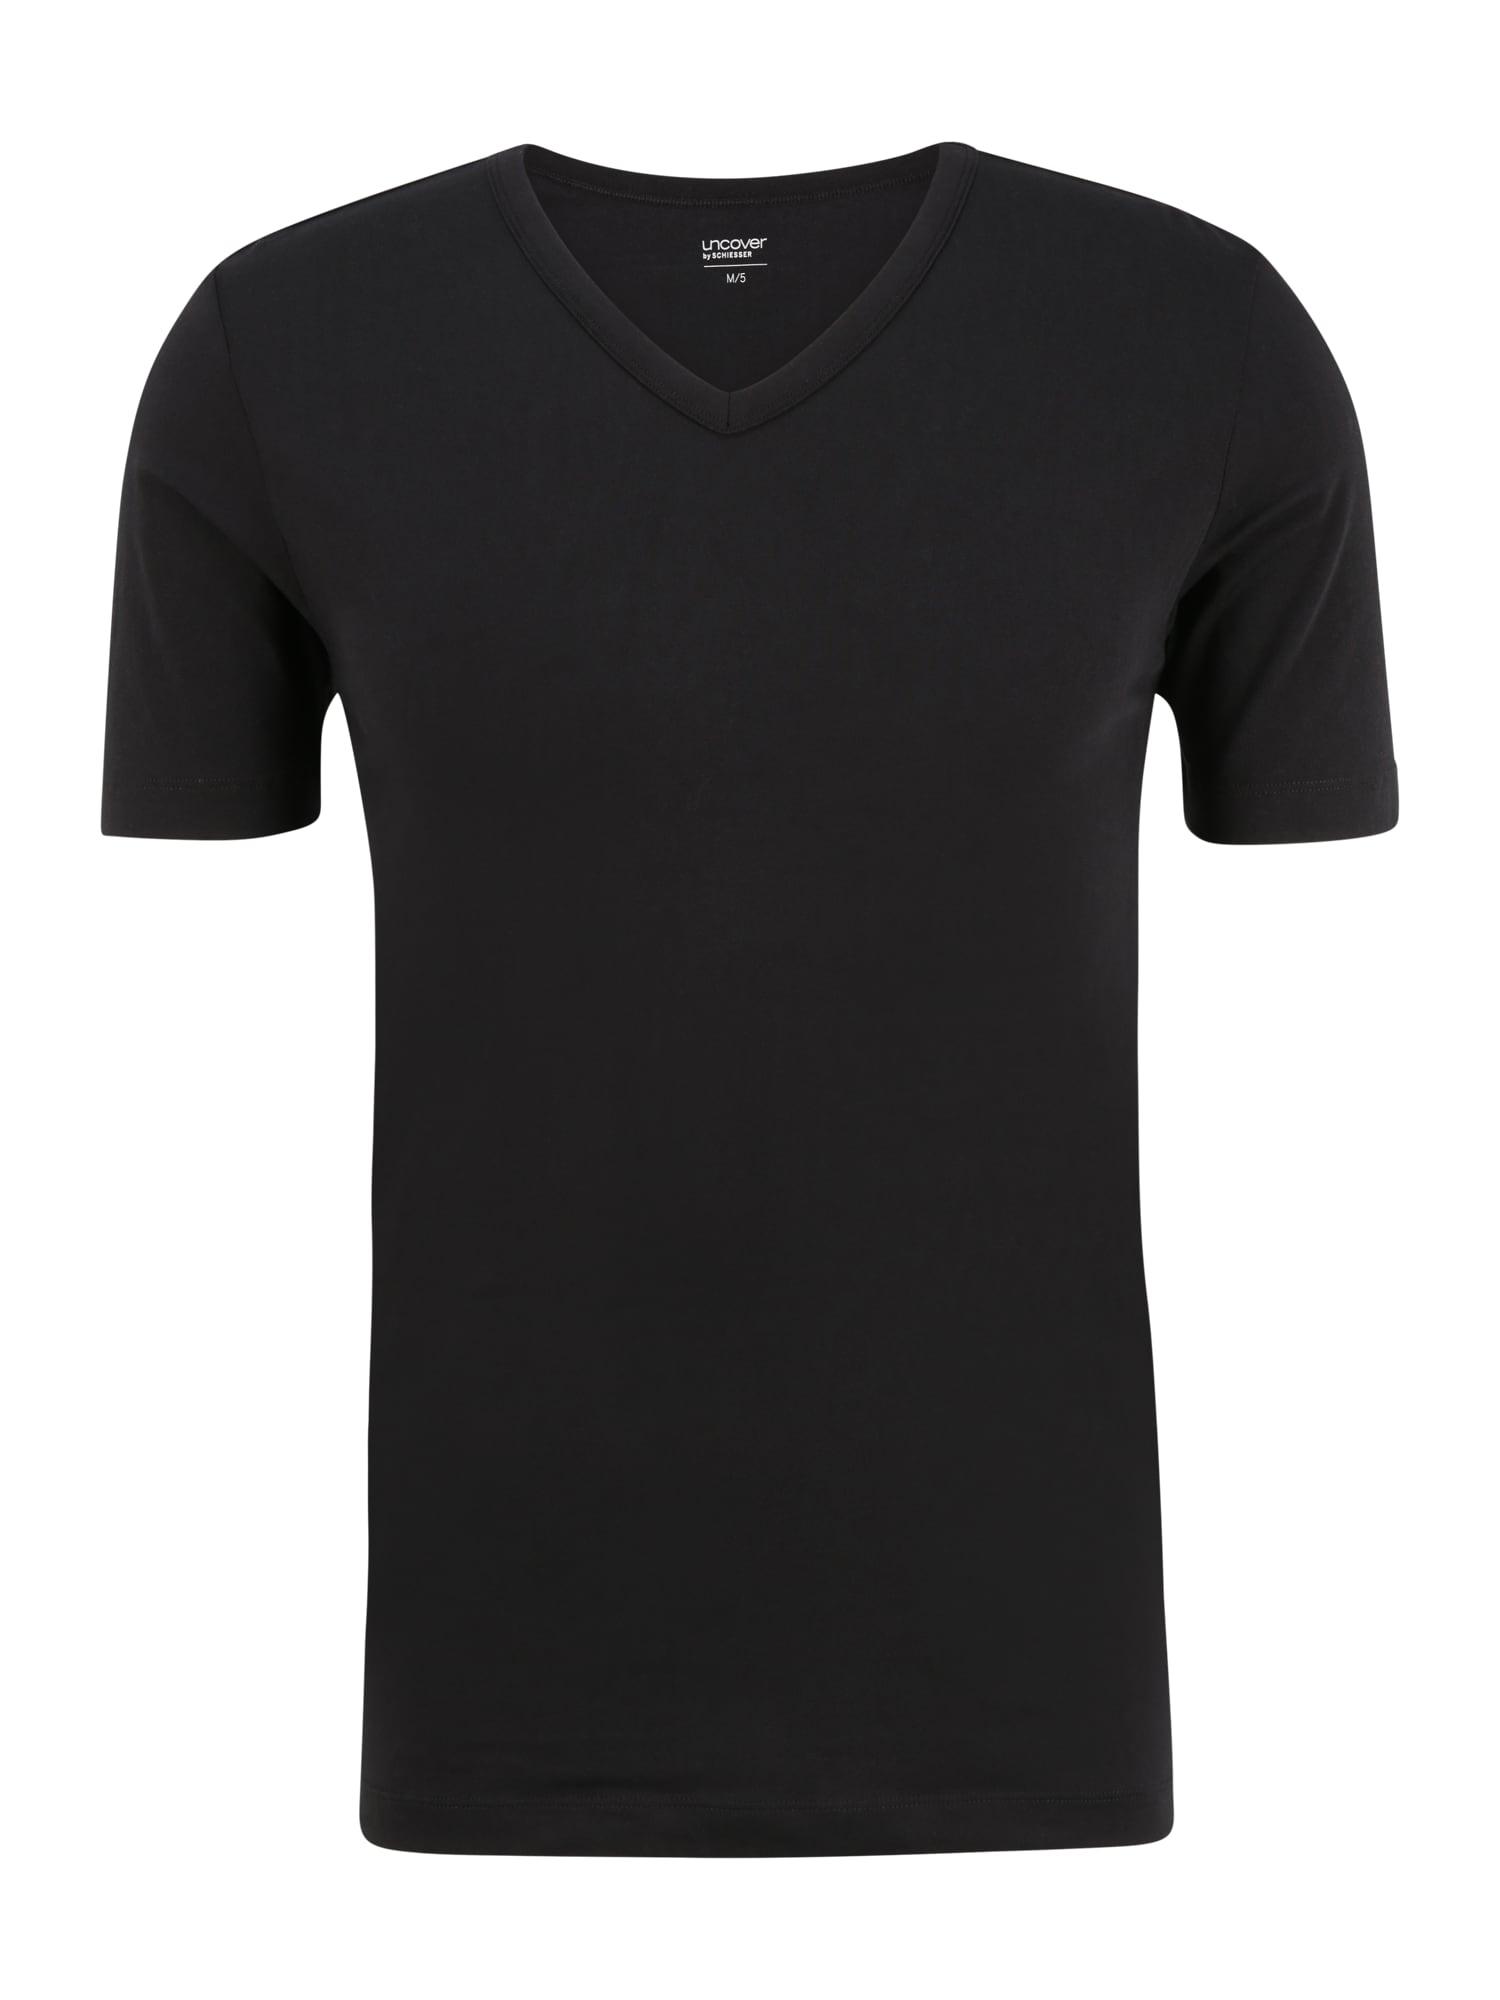 uncover by SCHIESSER Marškinėliai juoda